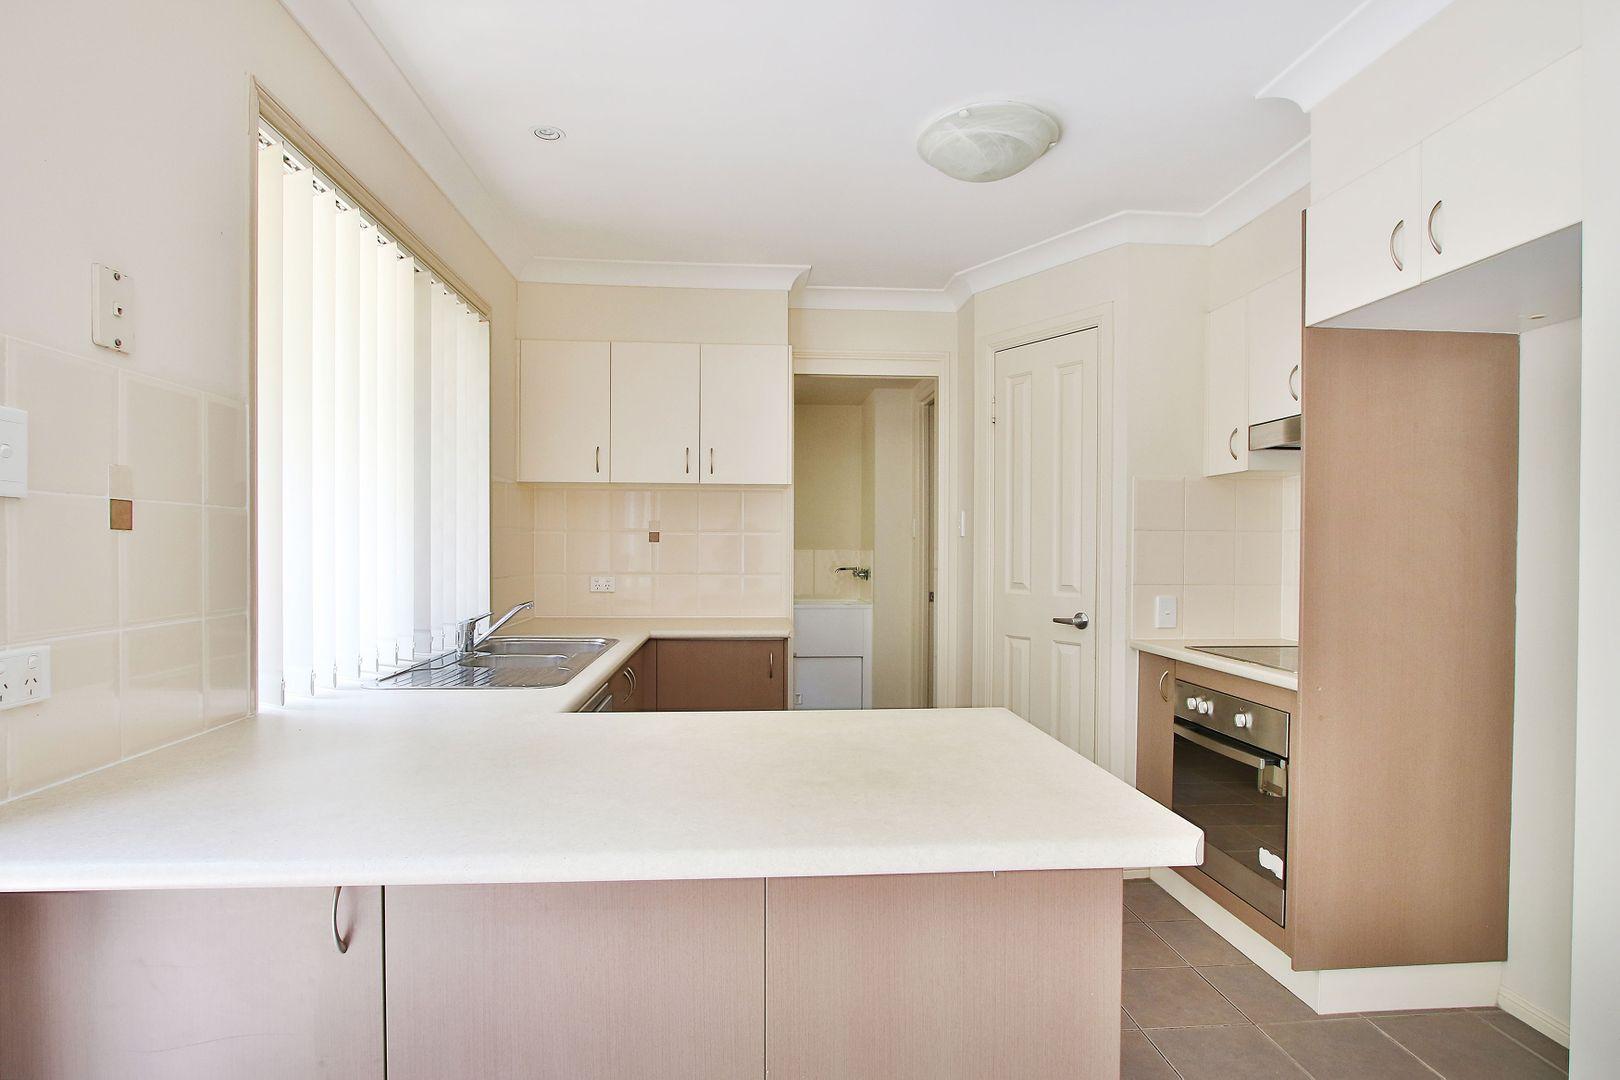 19/19 Kathleen Street, Richlands QLD 4077, Image 1